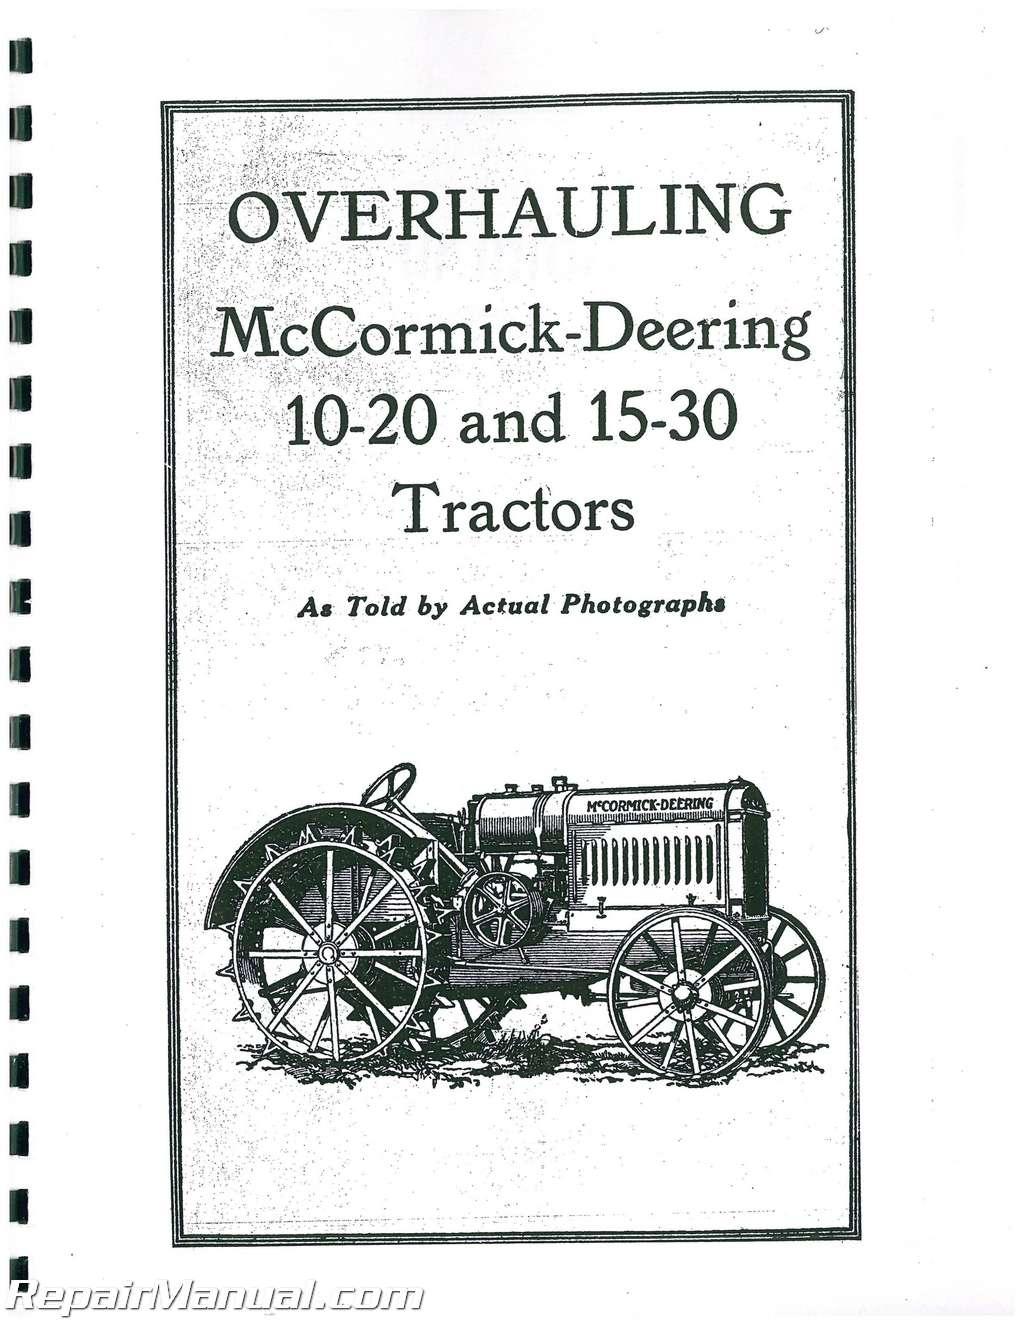 Mccormick Tractor Ignition Wiring Diagram Diagrams International Harvester Deering 10 20 15 30 22 36 Rh Repairmanual Com Case